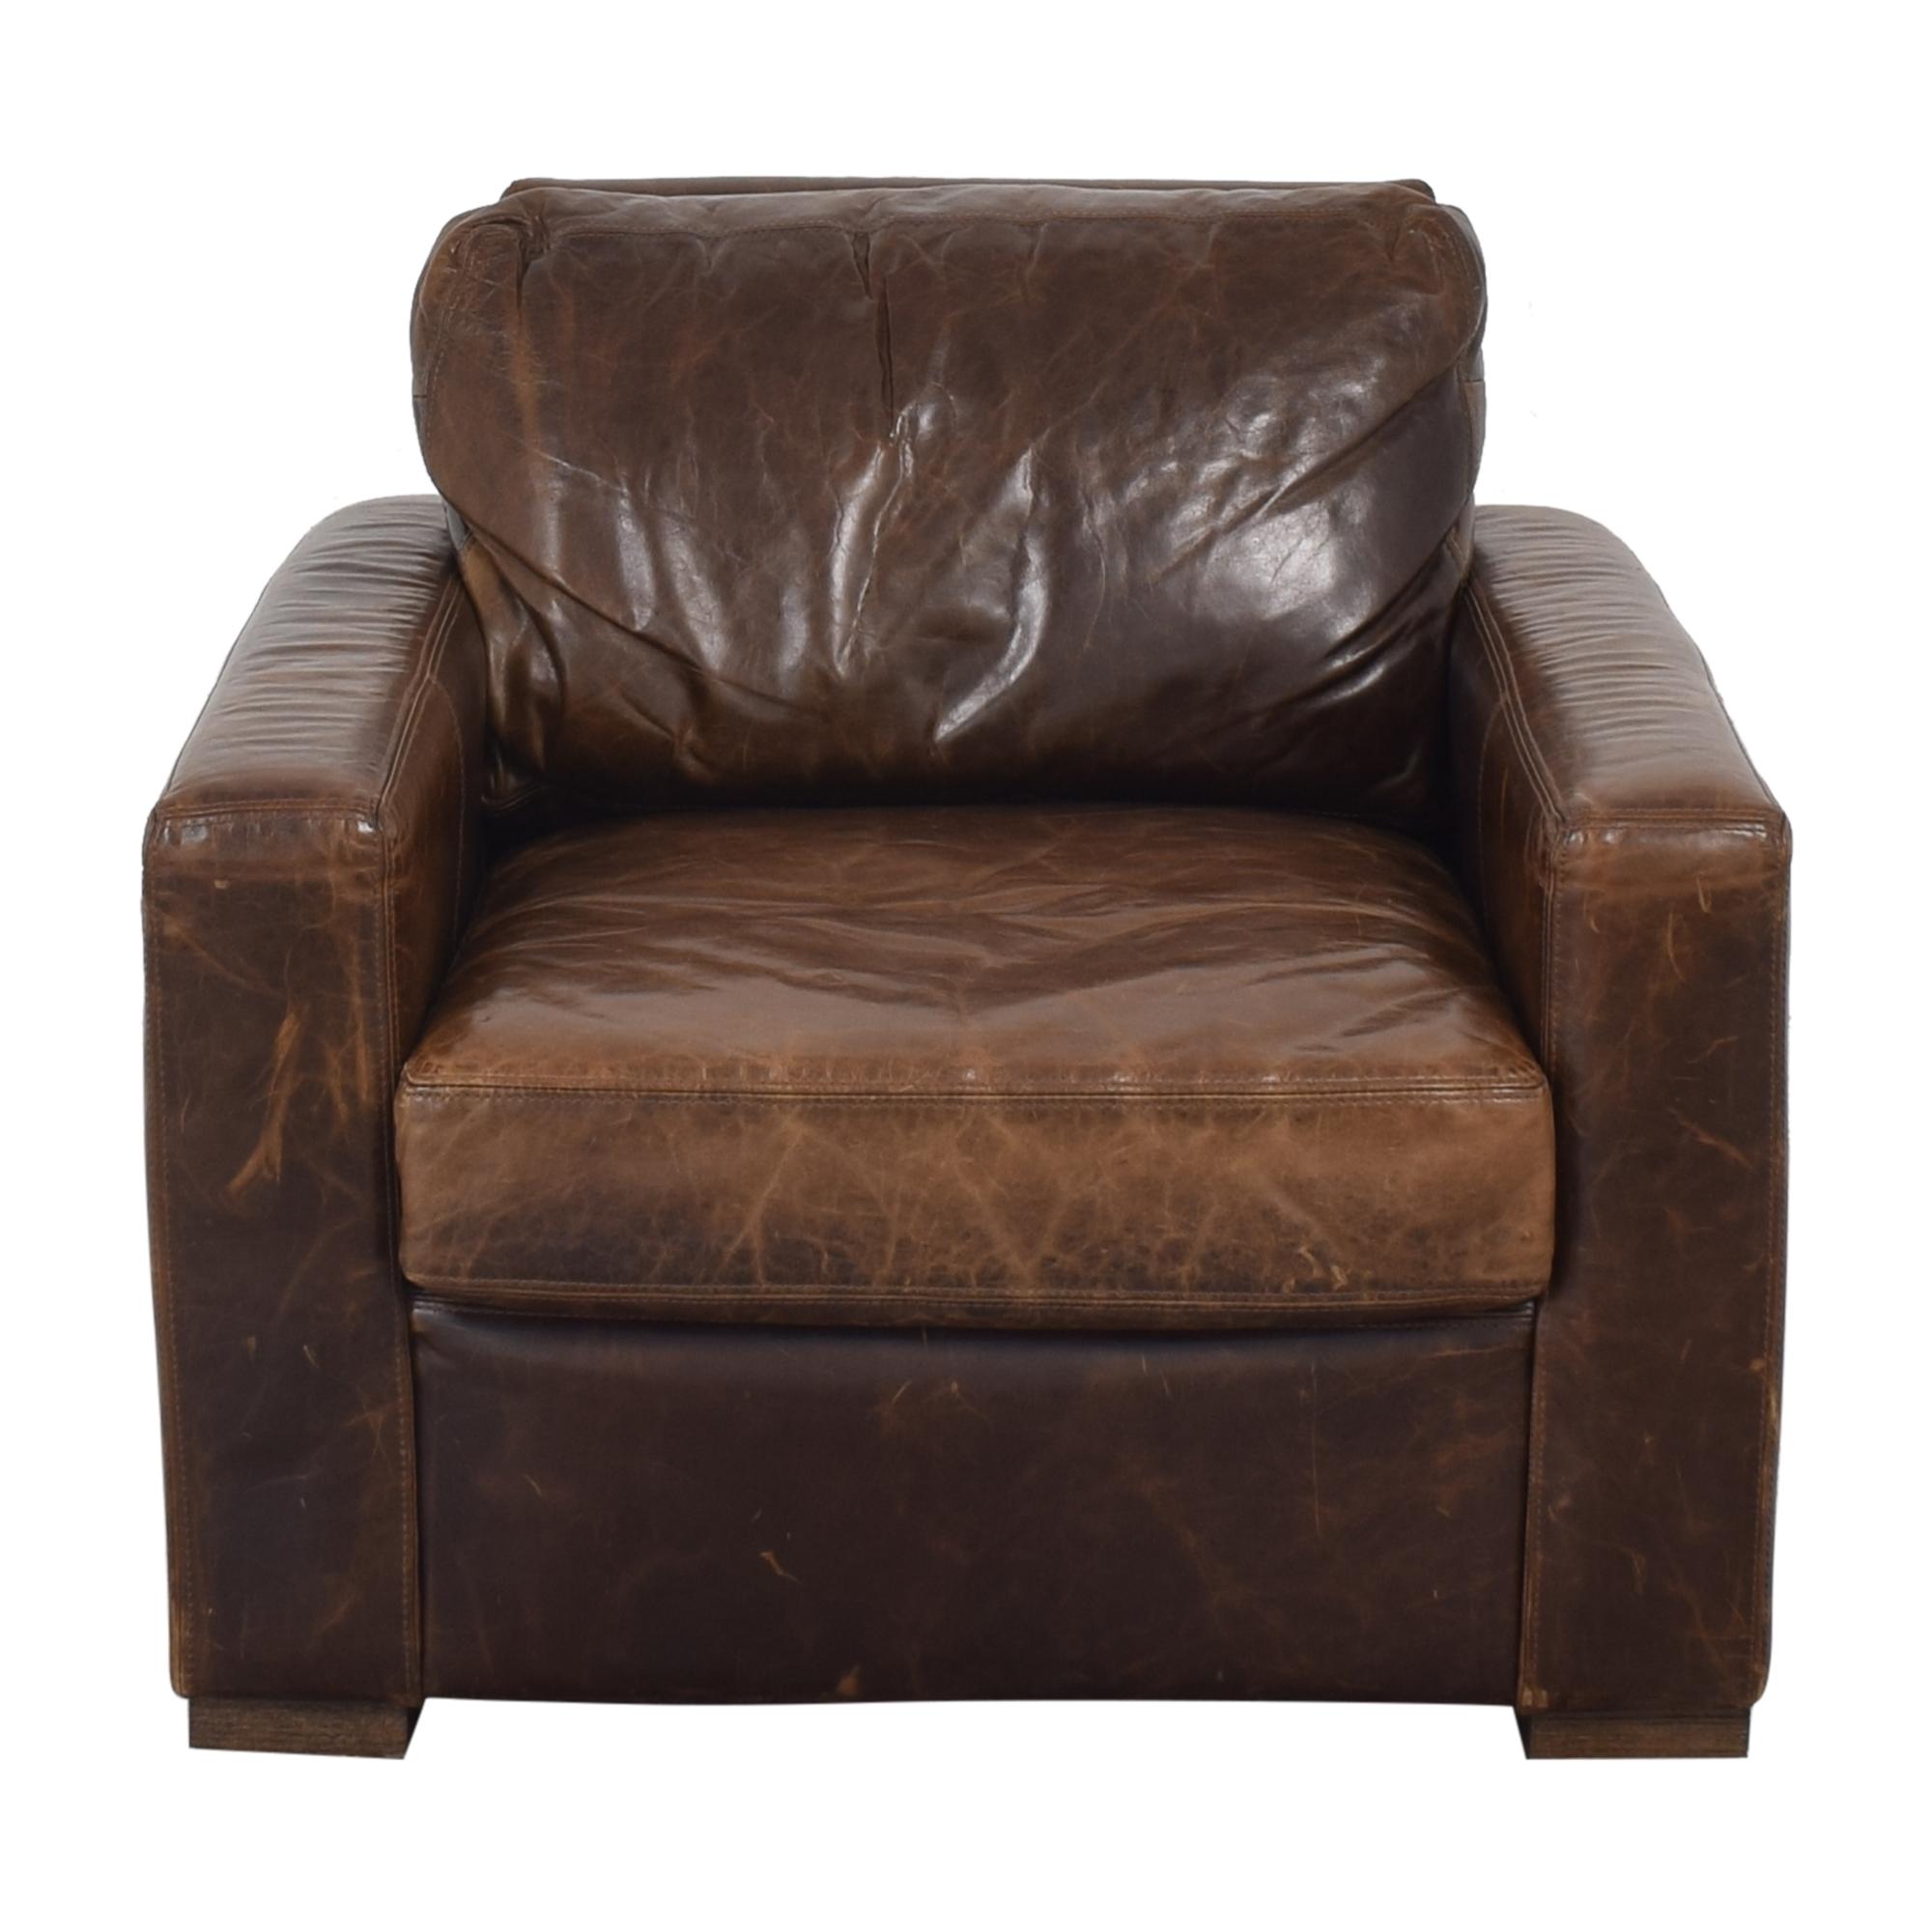 buy Restoration Hardware Petite Maxwell Chair and Ottoman Restoration Hardware Accent Chairs